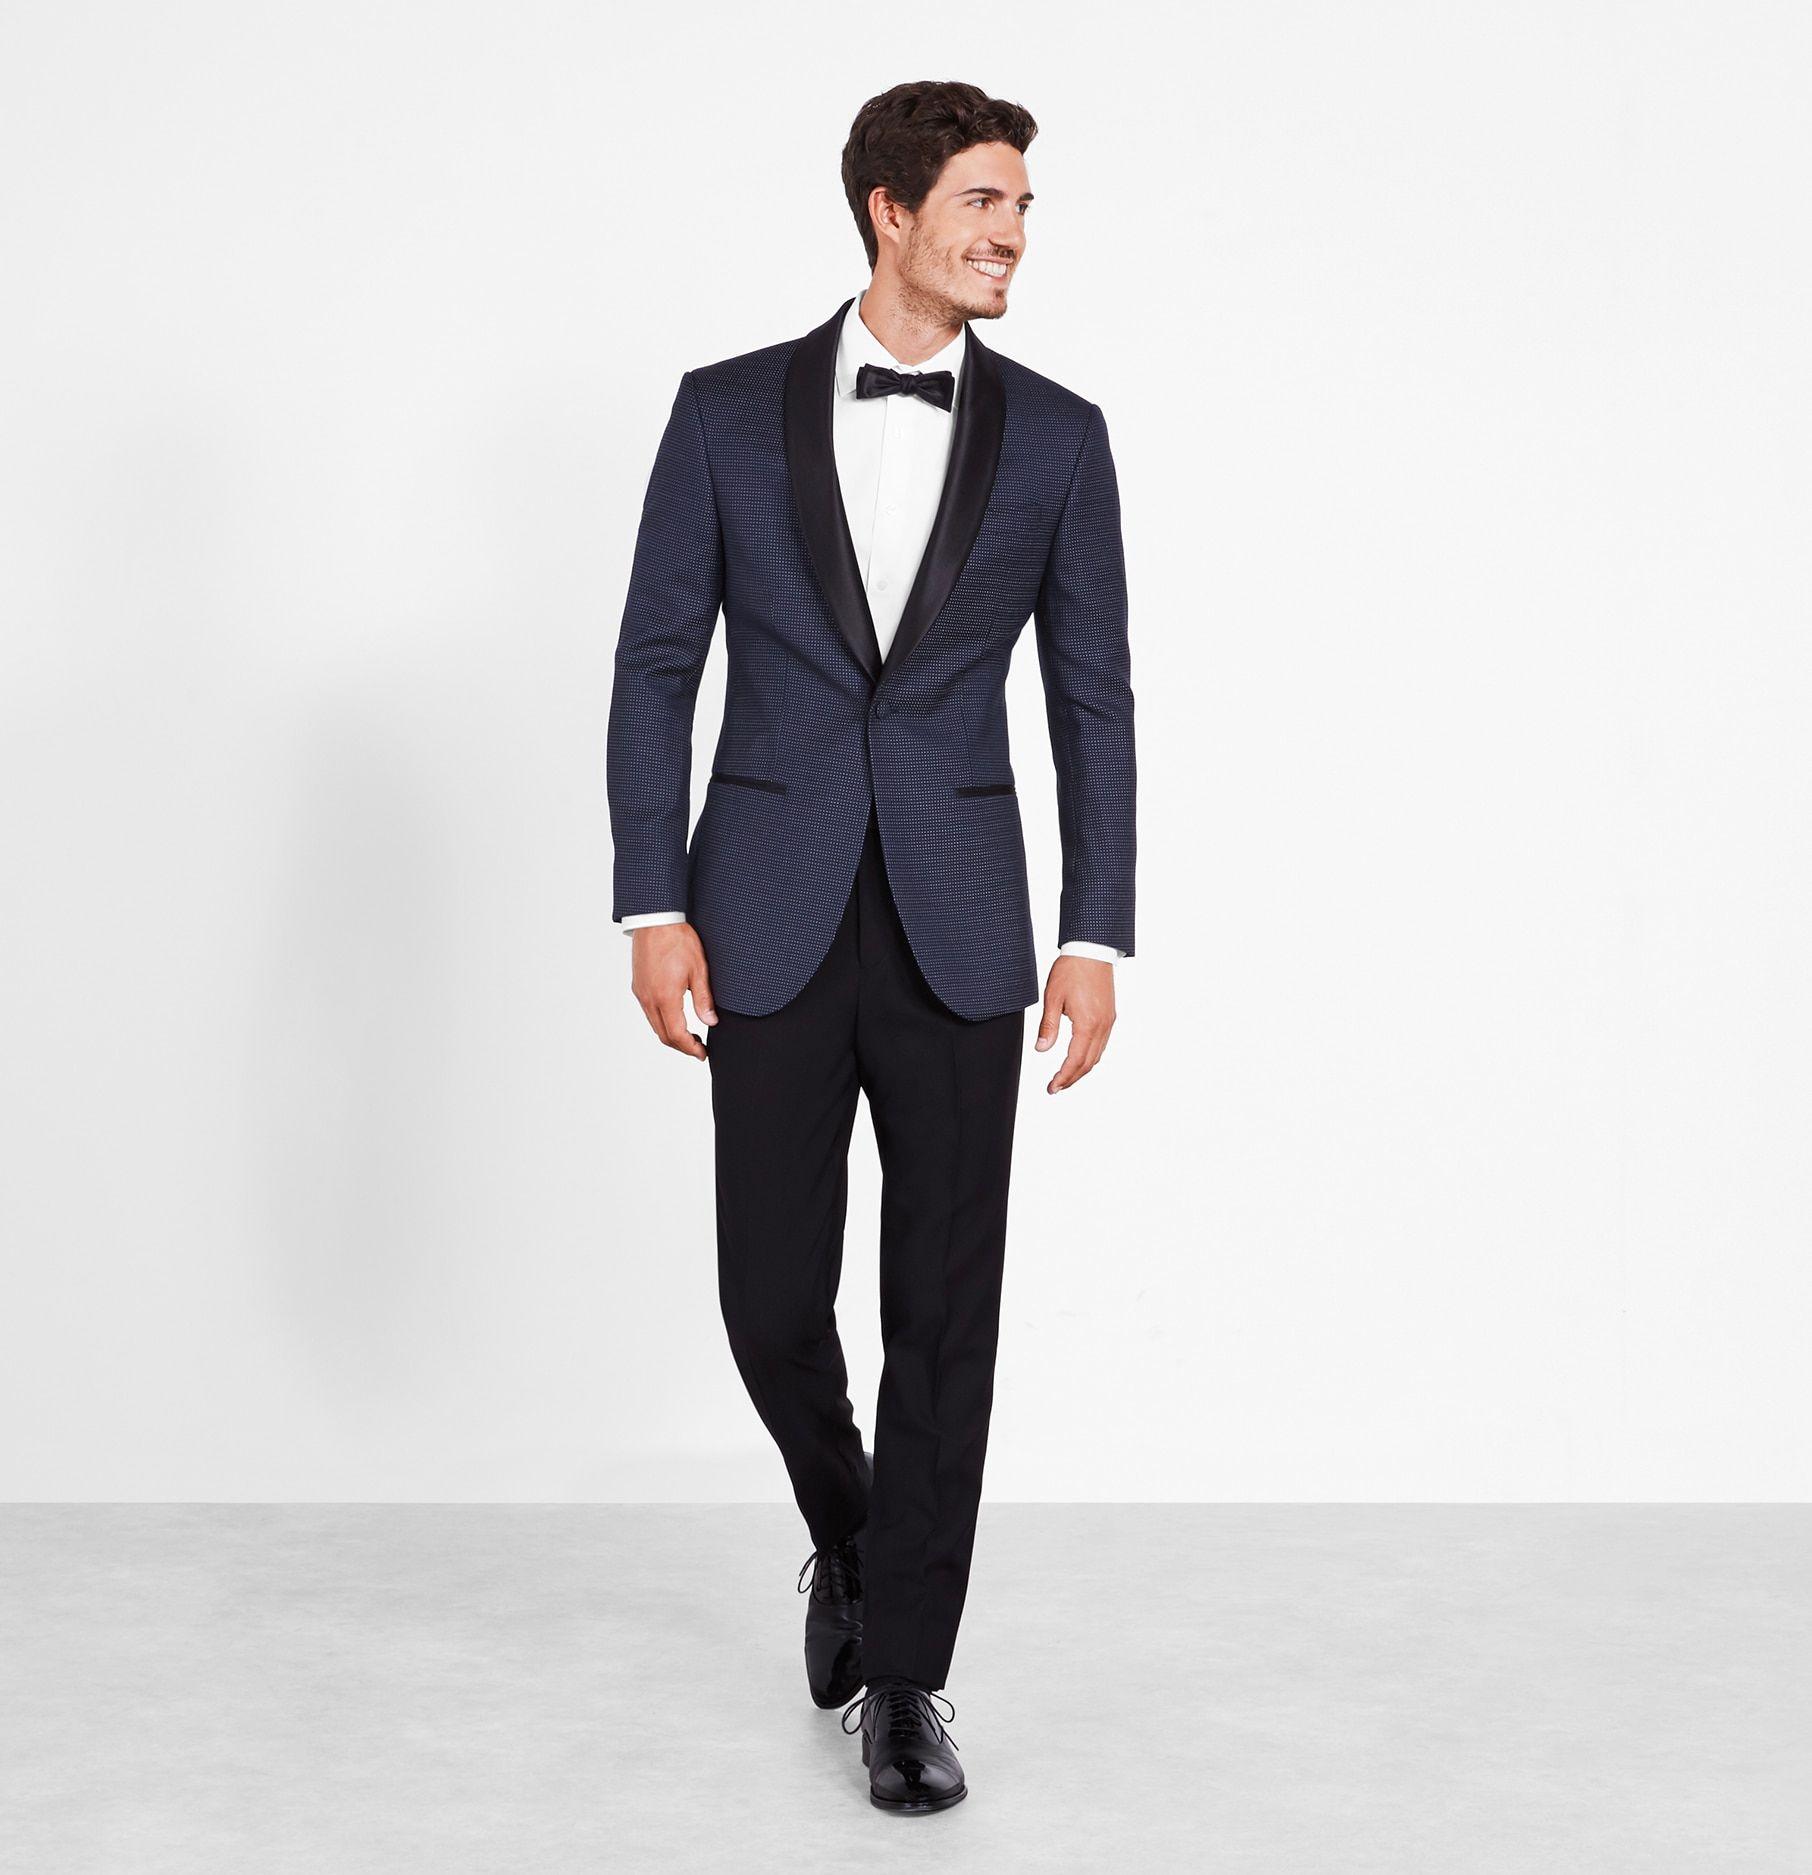 Midnight Pin Dot Tuxedo The Black Tux Black Tux Blue Tuxedo Wedding